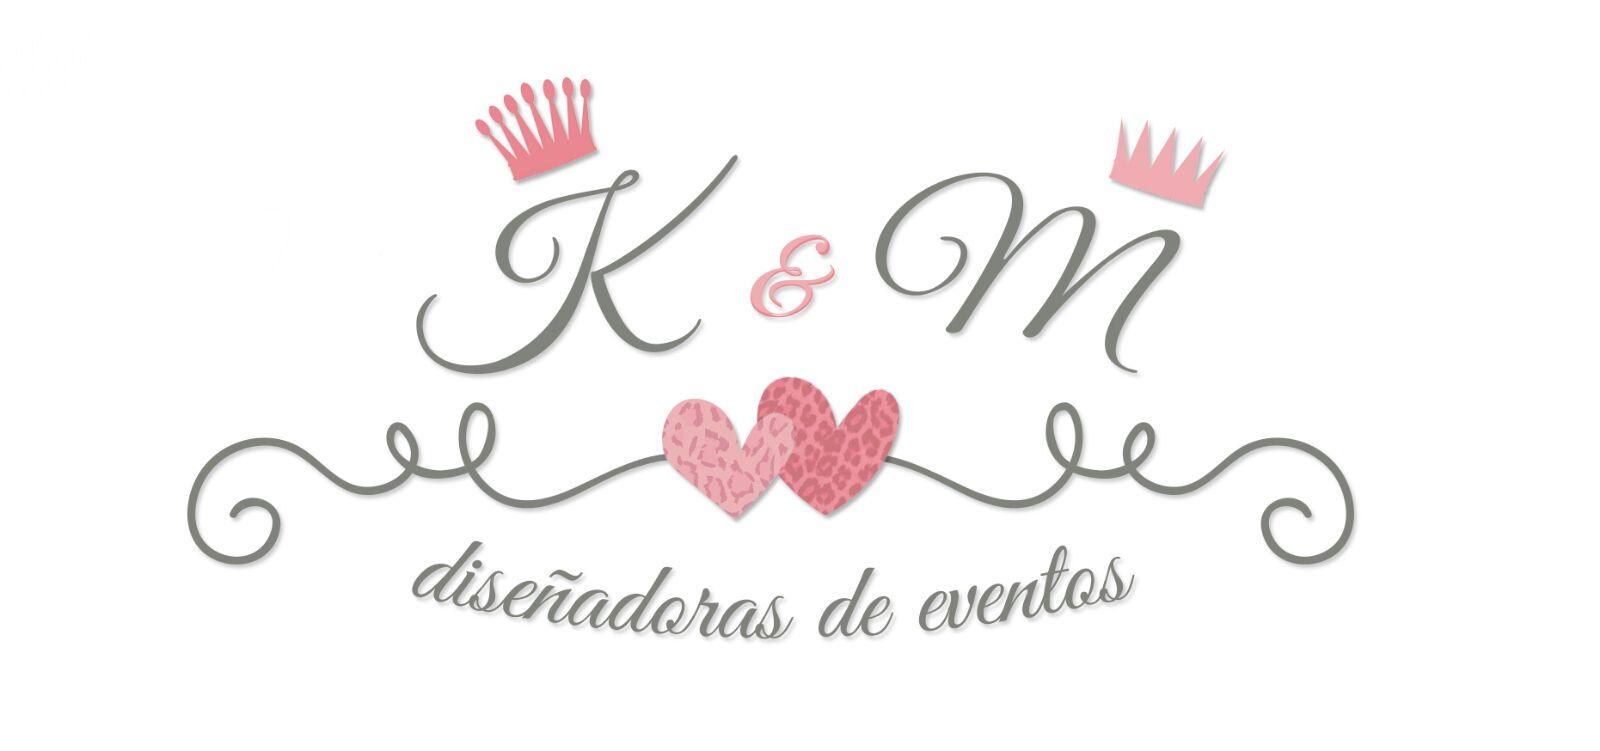 K&M Diseñadoras de Eventos